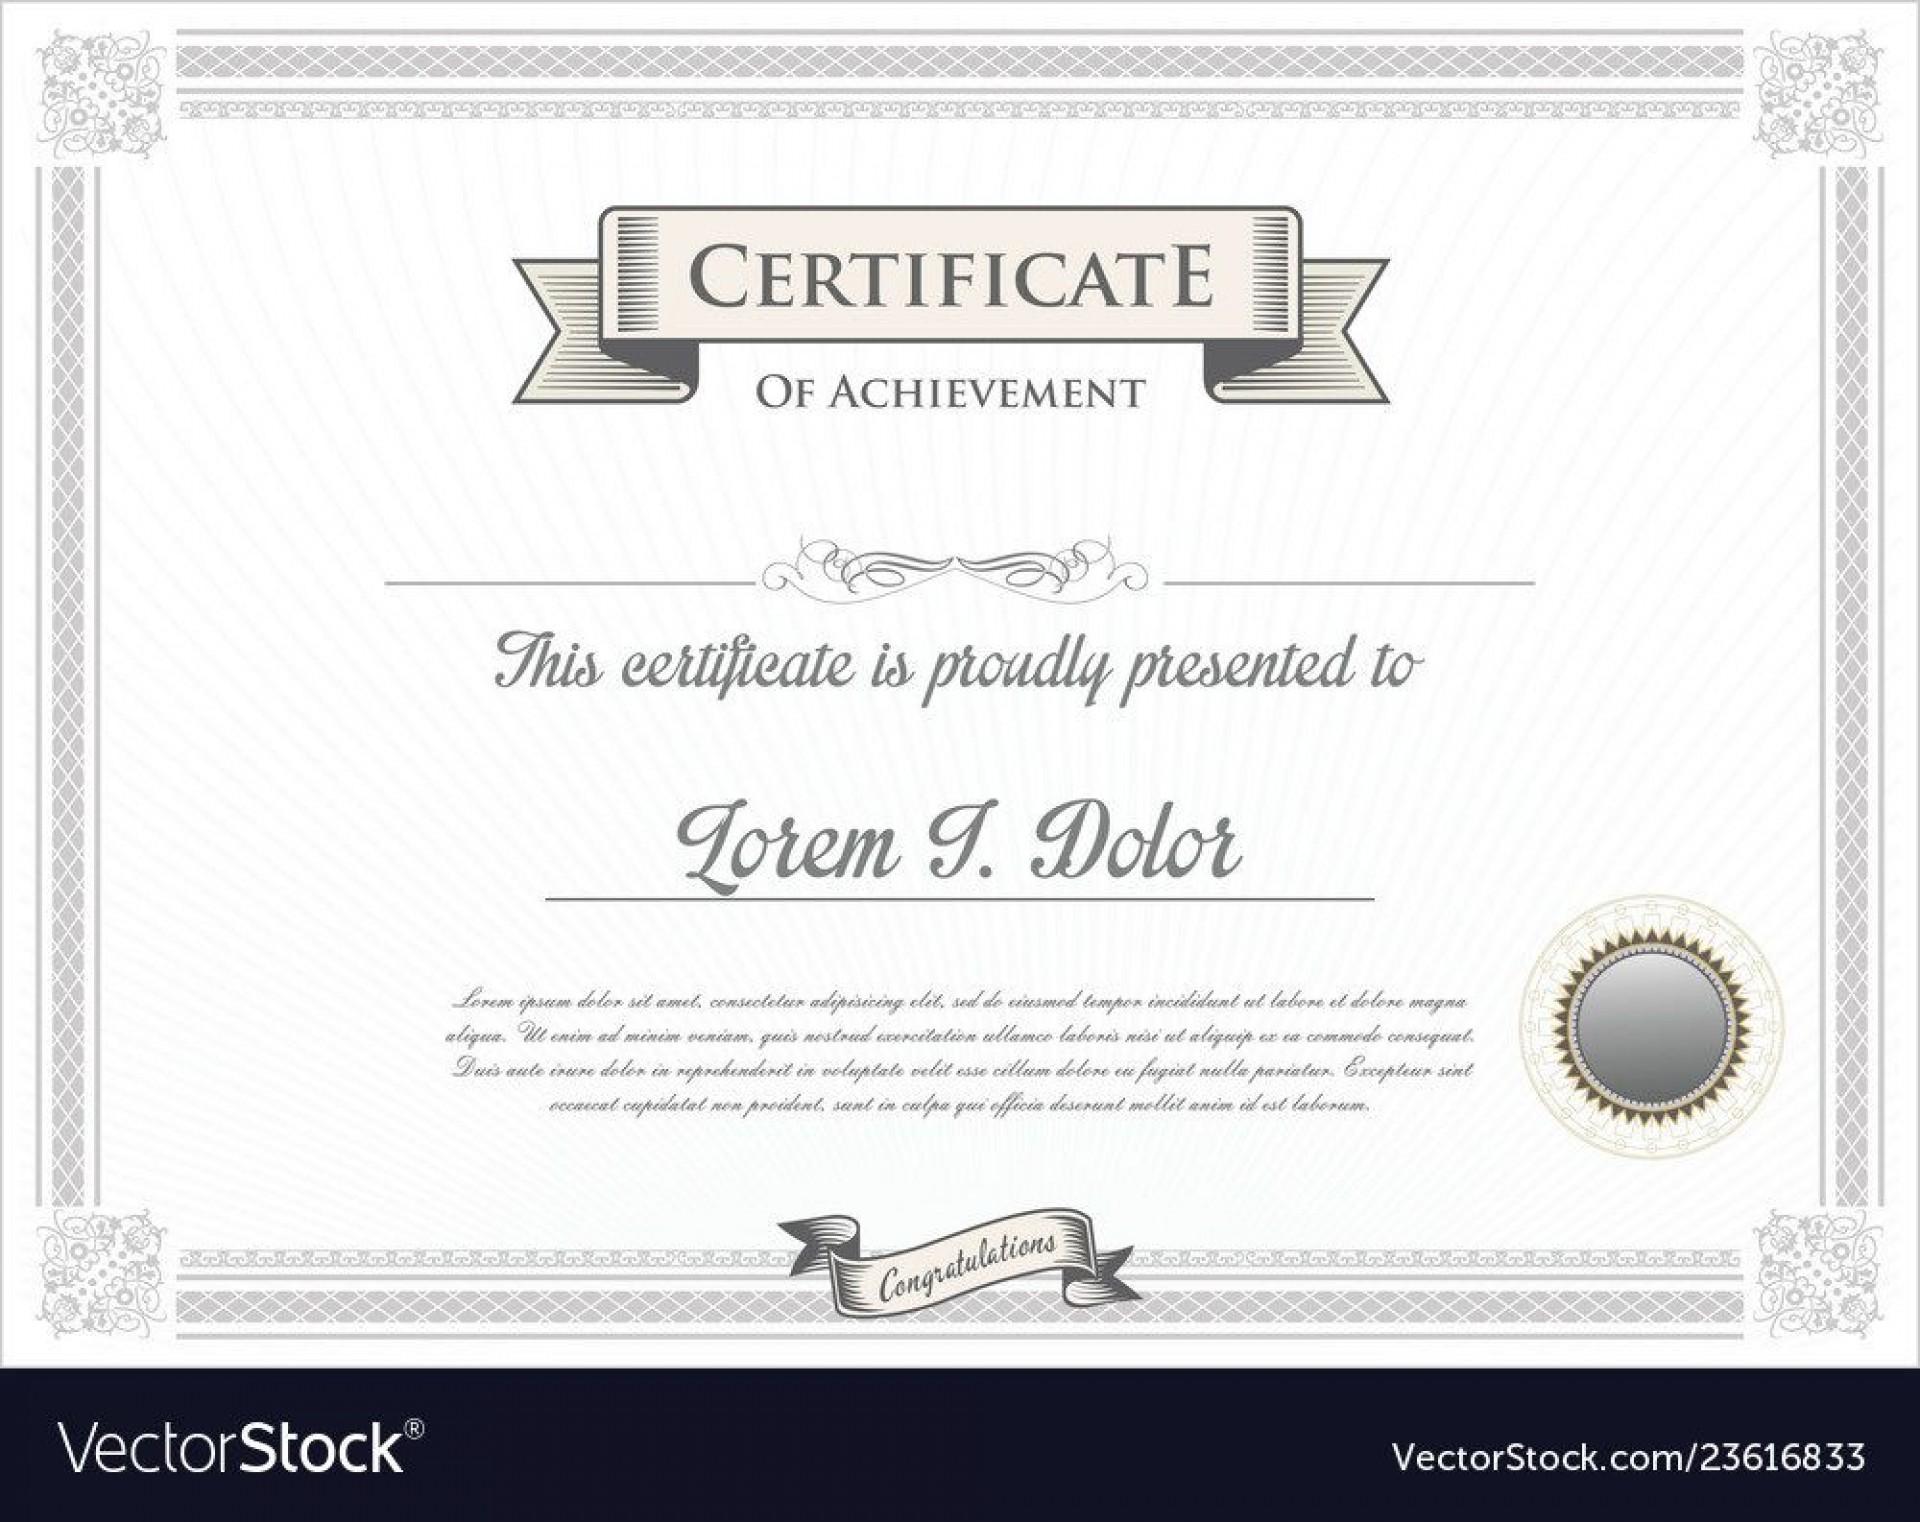 005 Sensational Free Diploma Template Download High Definition  Word Certificate School Appreciation1920